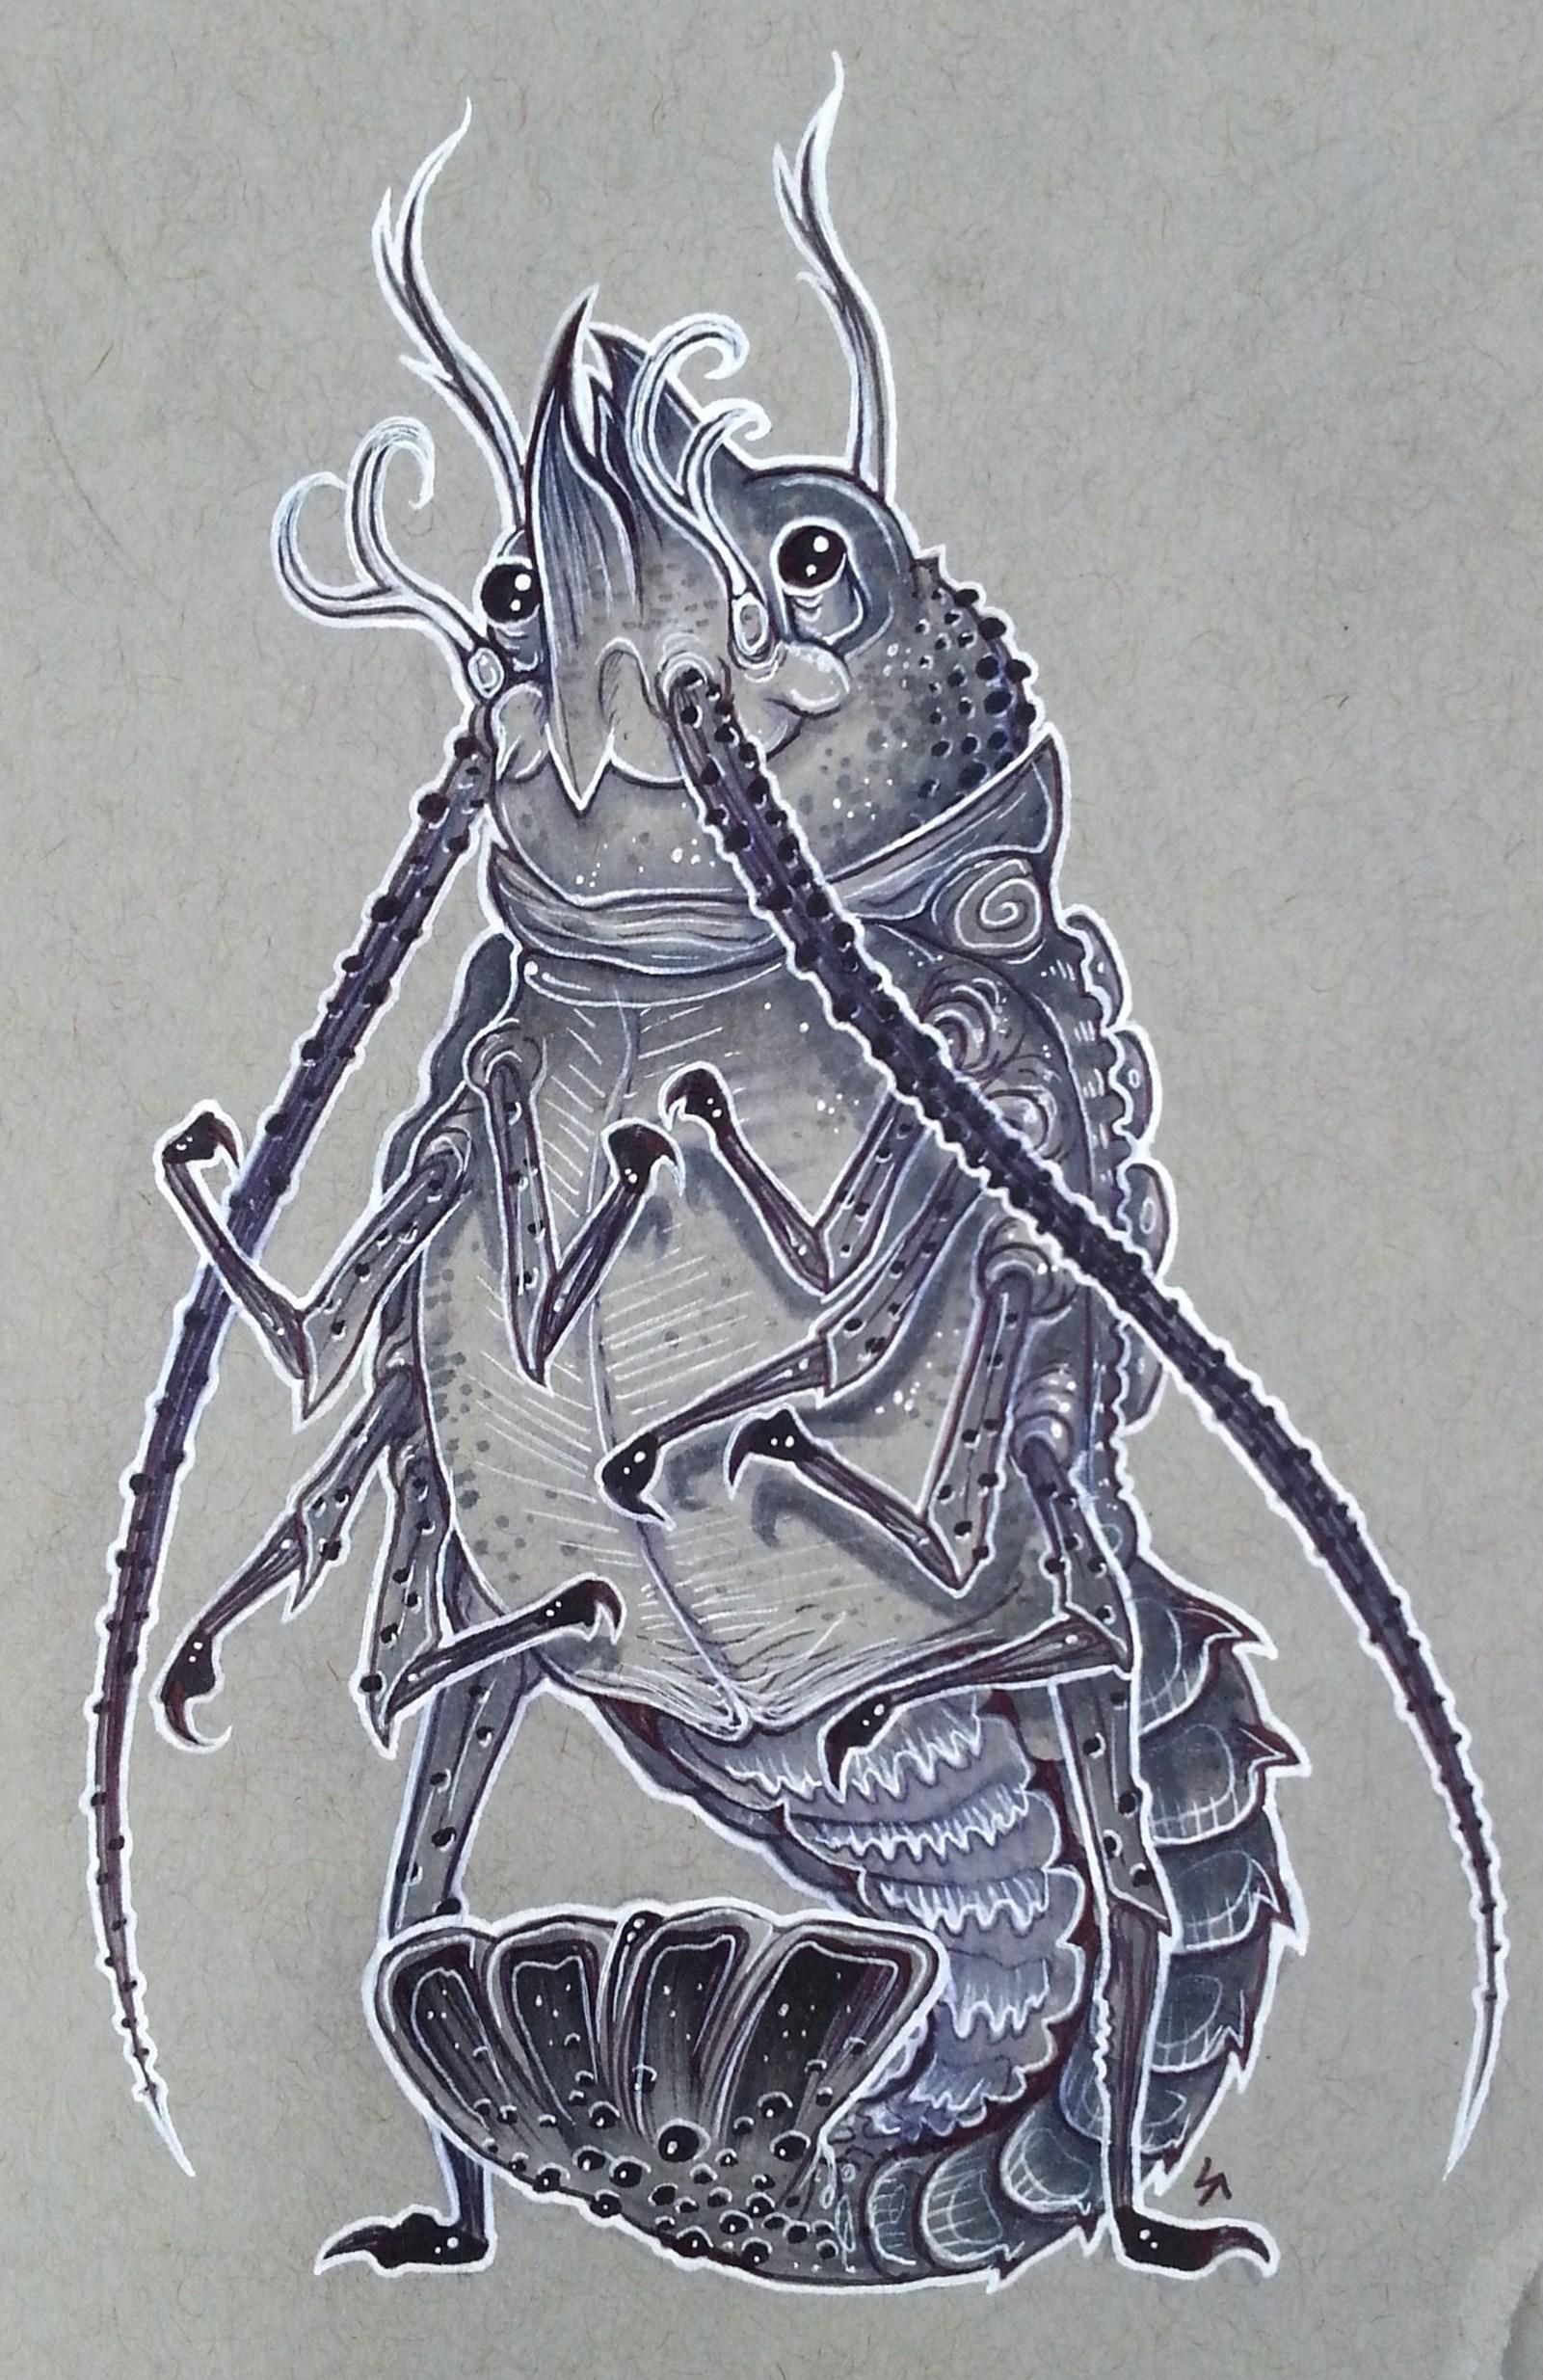 furvilla_lobster_by_shon2-dc5sp2q.jpg